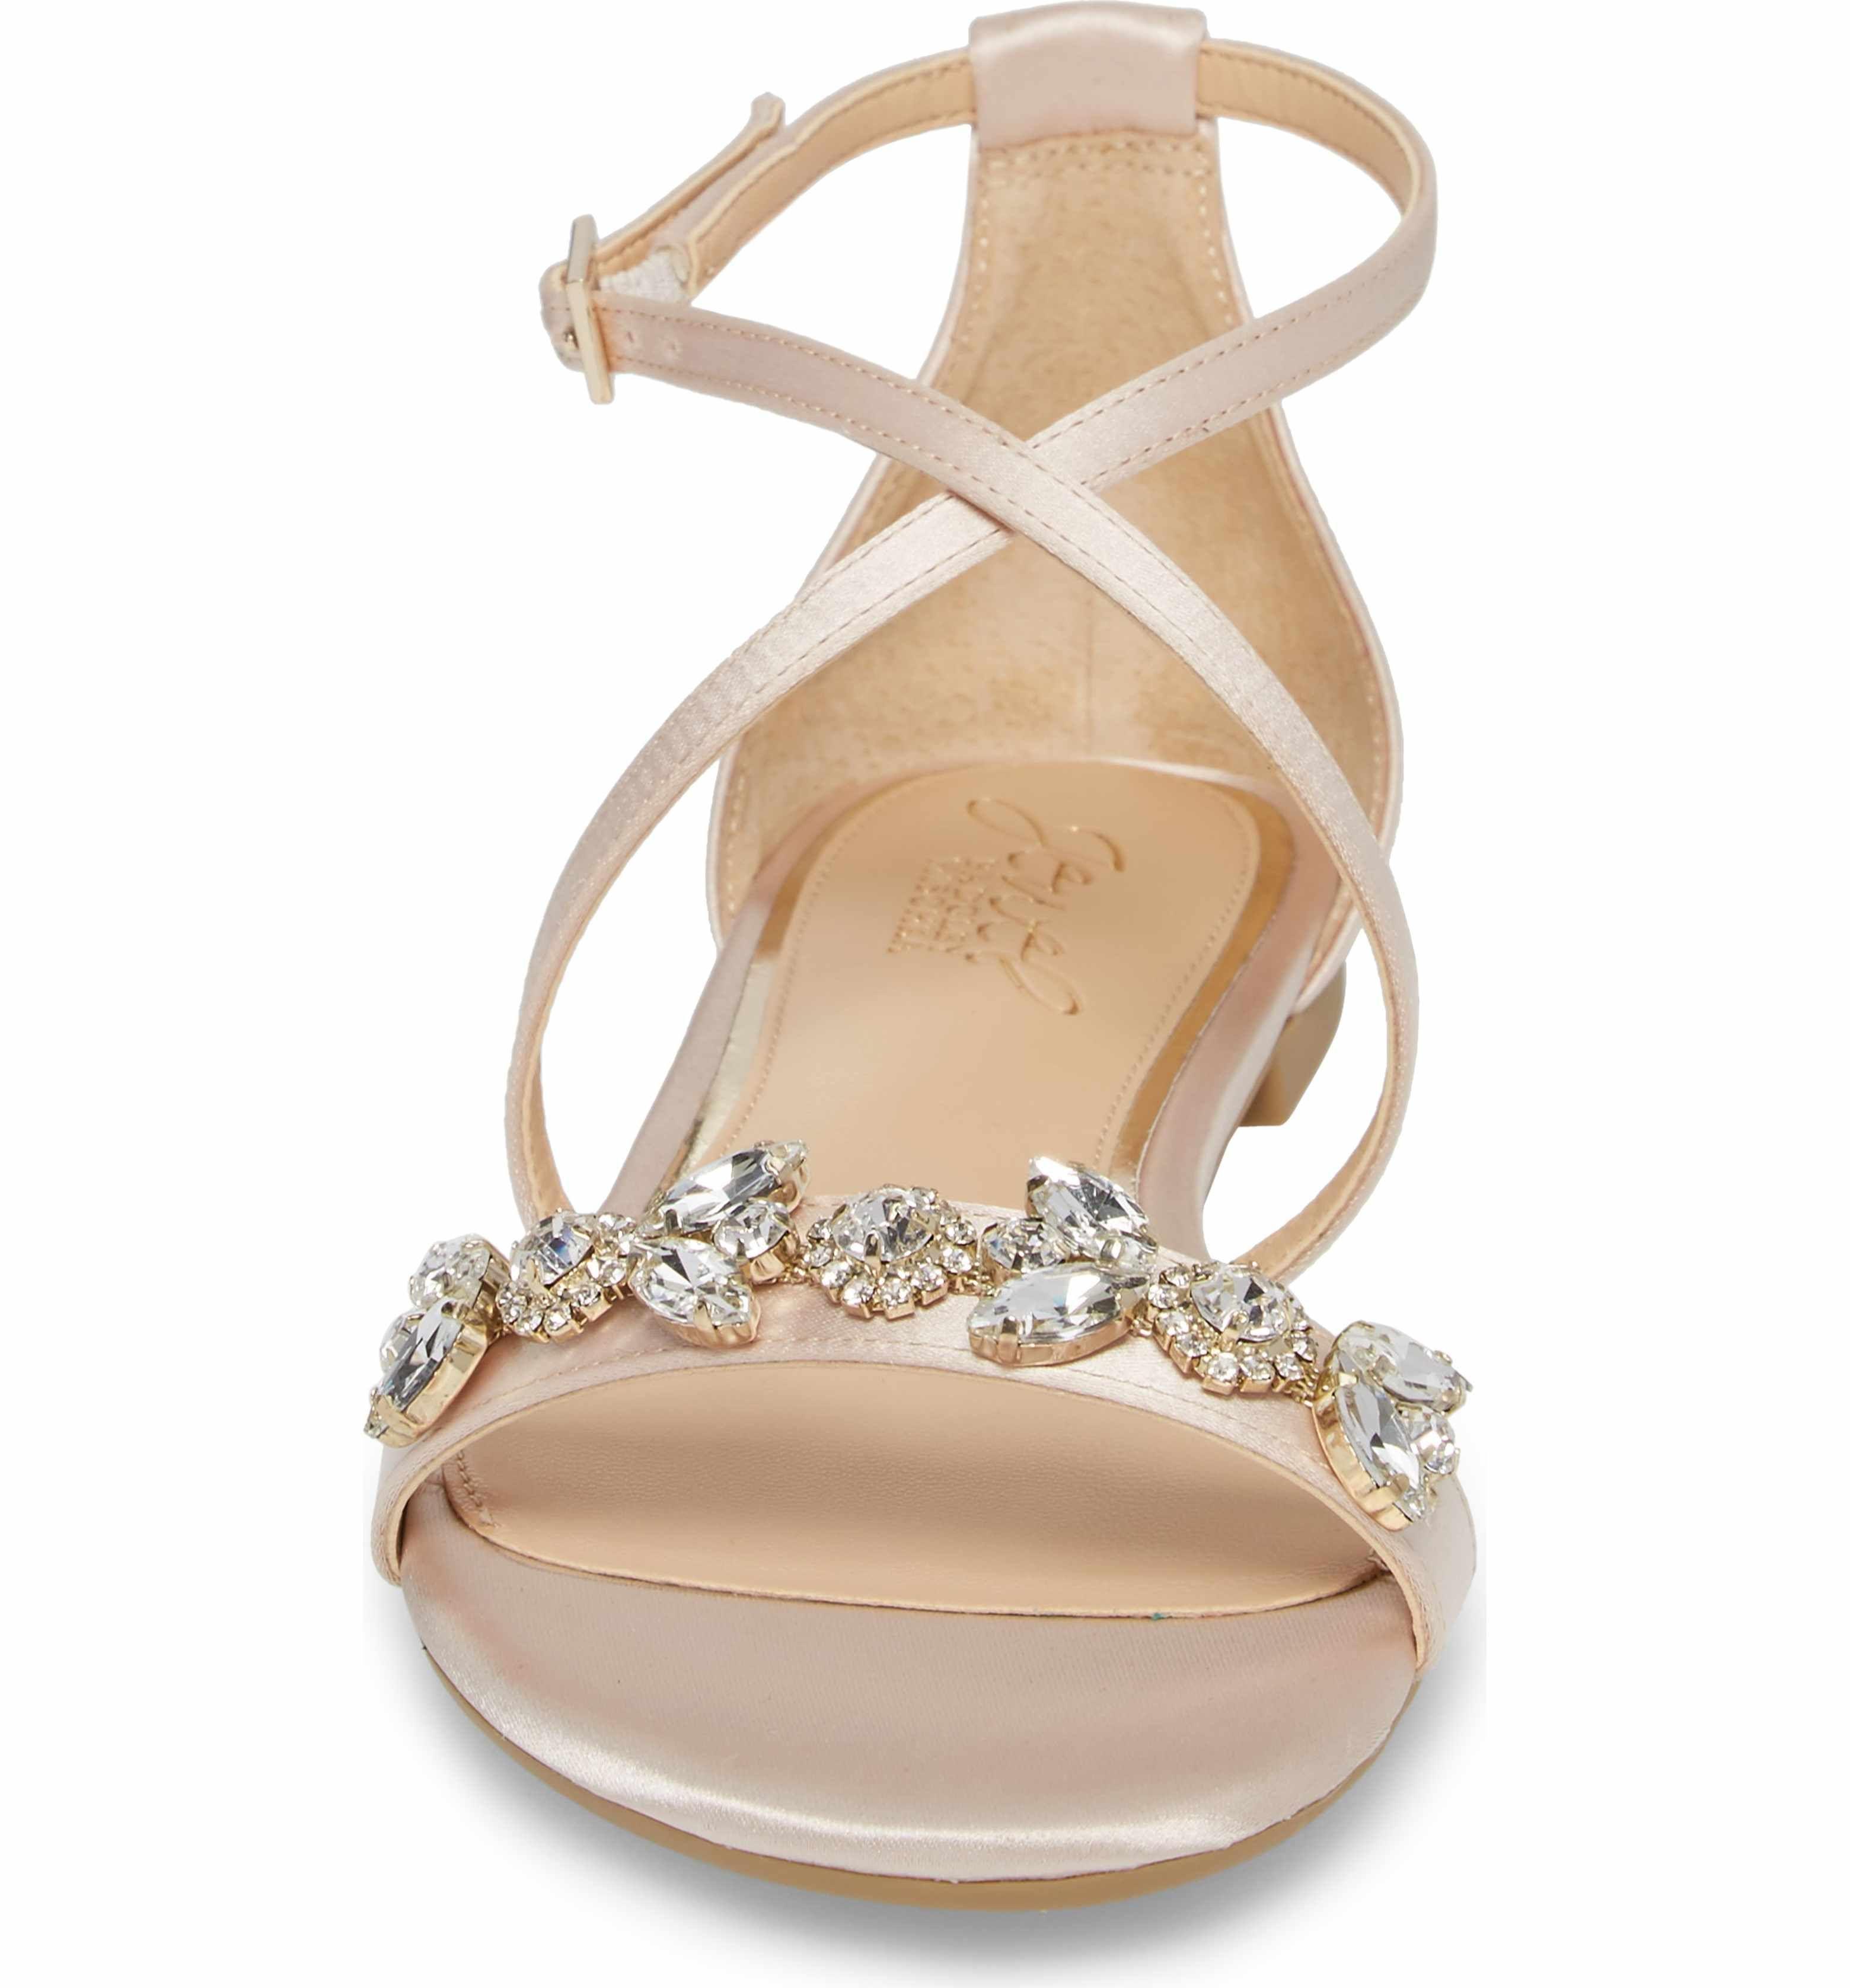 558399d22 Main Image - Jewel Badgley Mischka Tessy Embellished Sandal (Women ...